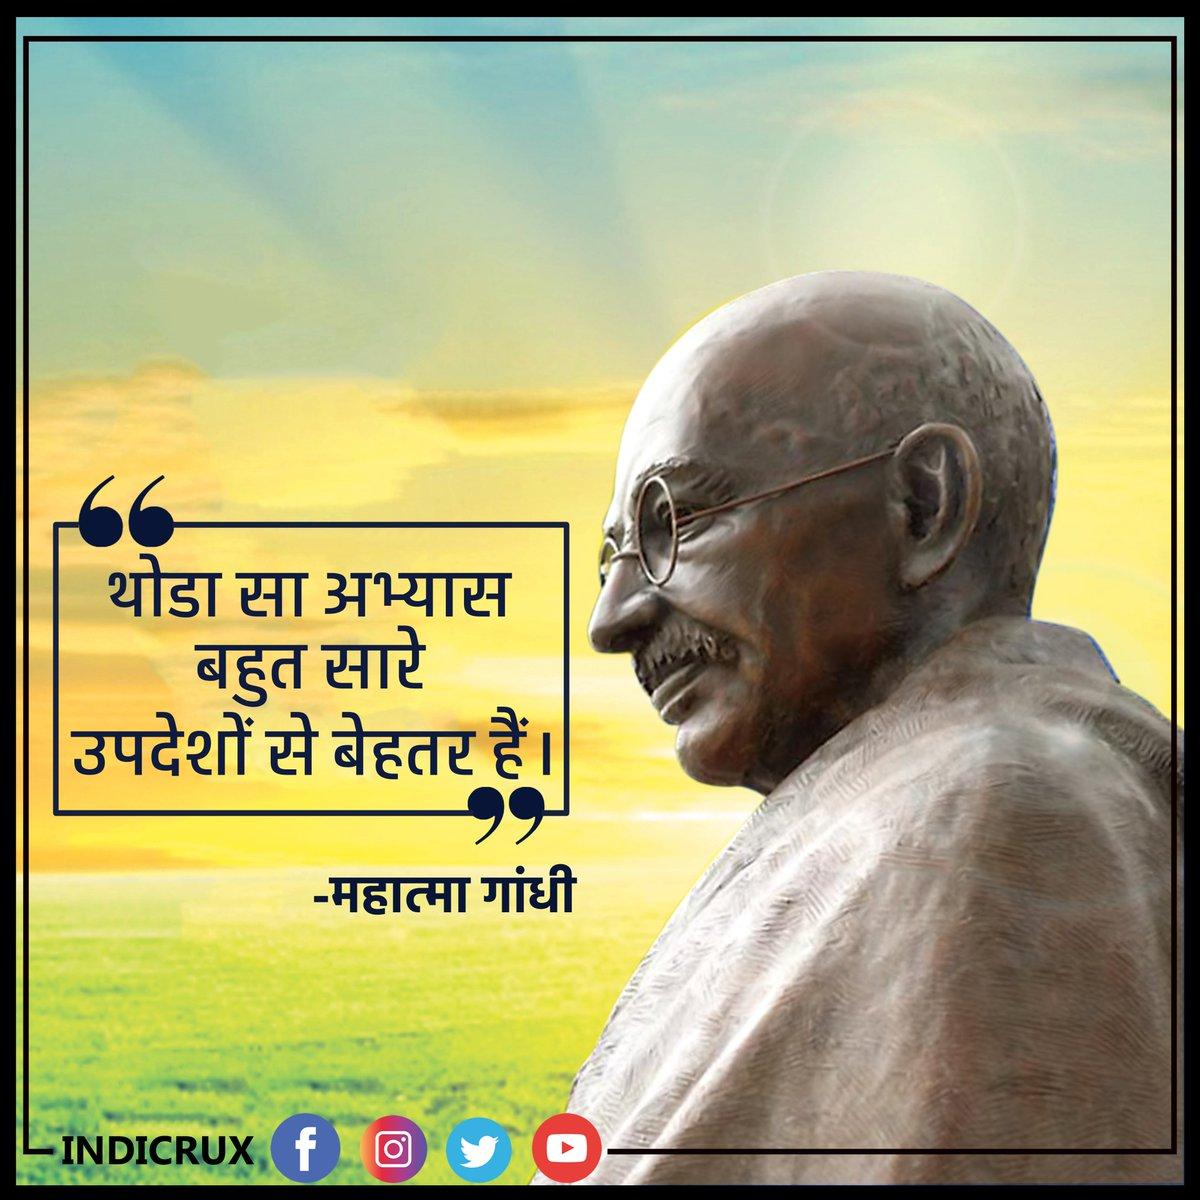 थोड़ा सा अभ्यास बहुत सारे उपदेशों से बेहतर हैं। ... #gandhiji #gandhi #mahatmagandhi #india #gandhijayanti #gandhiquotes #freedom #indian #mahatma #fatherofthenation #peace #art #quotes #gandhijayanthi #bhfyp #love #bapu #fatherofnation #october #nonviolence